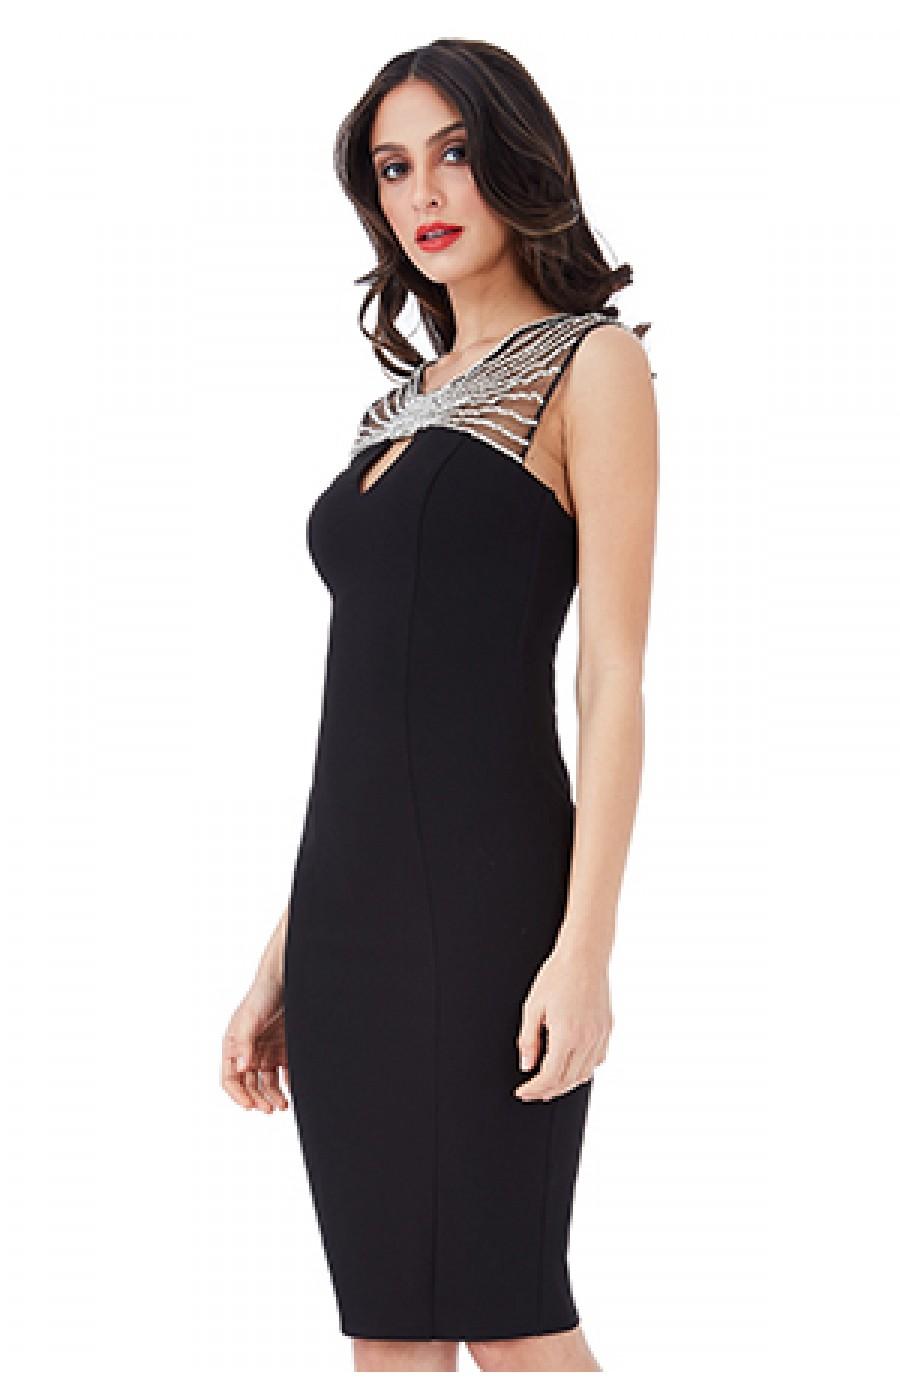 537ac95dc18a Μαυρο μίντι φόρεμα με στρας κεντημα στο λαιμο